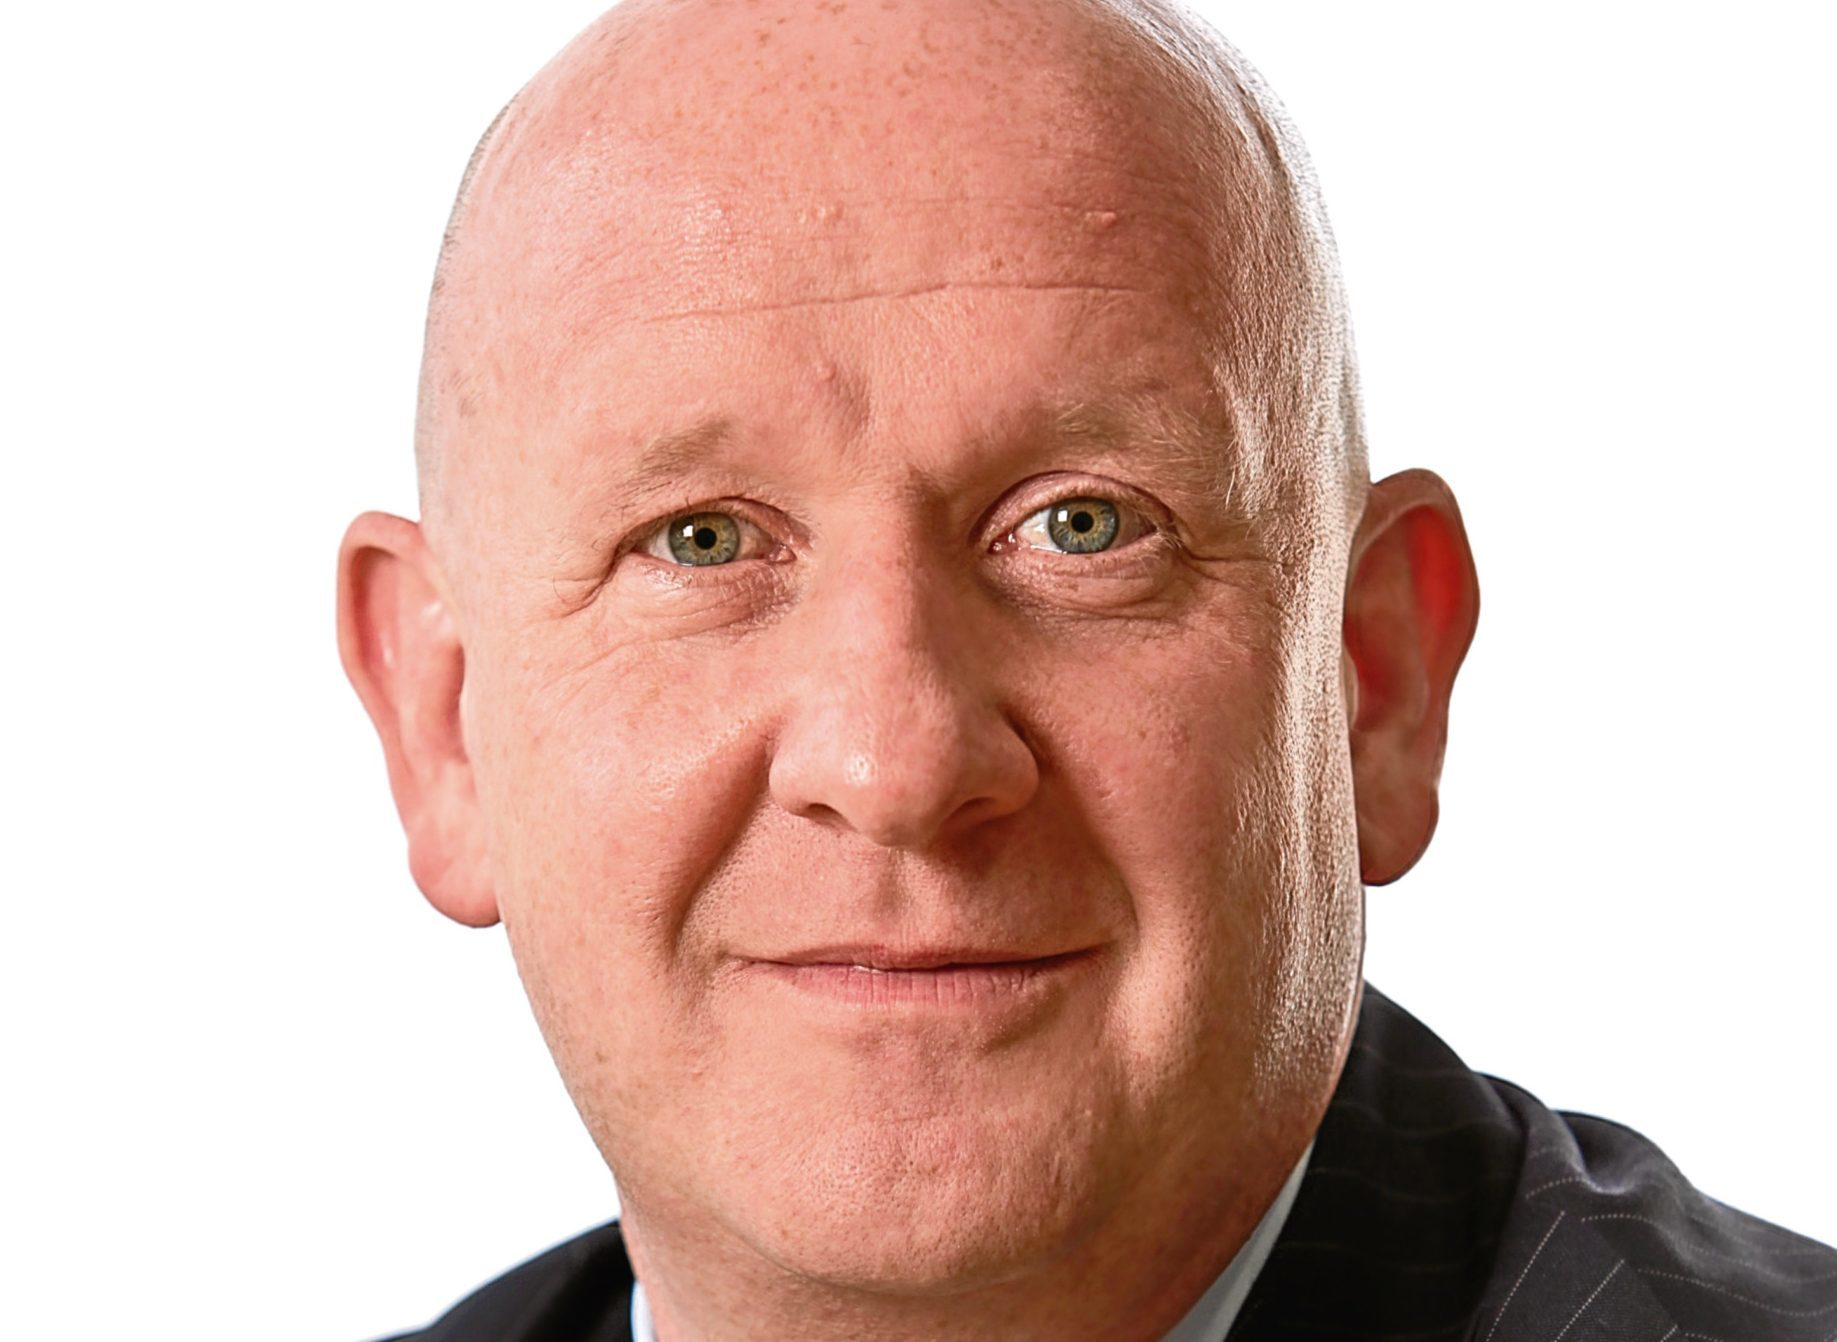 Craig Hendry, managing director at Johnston Carmichael Wealth